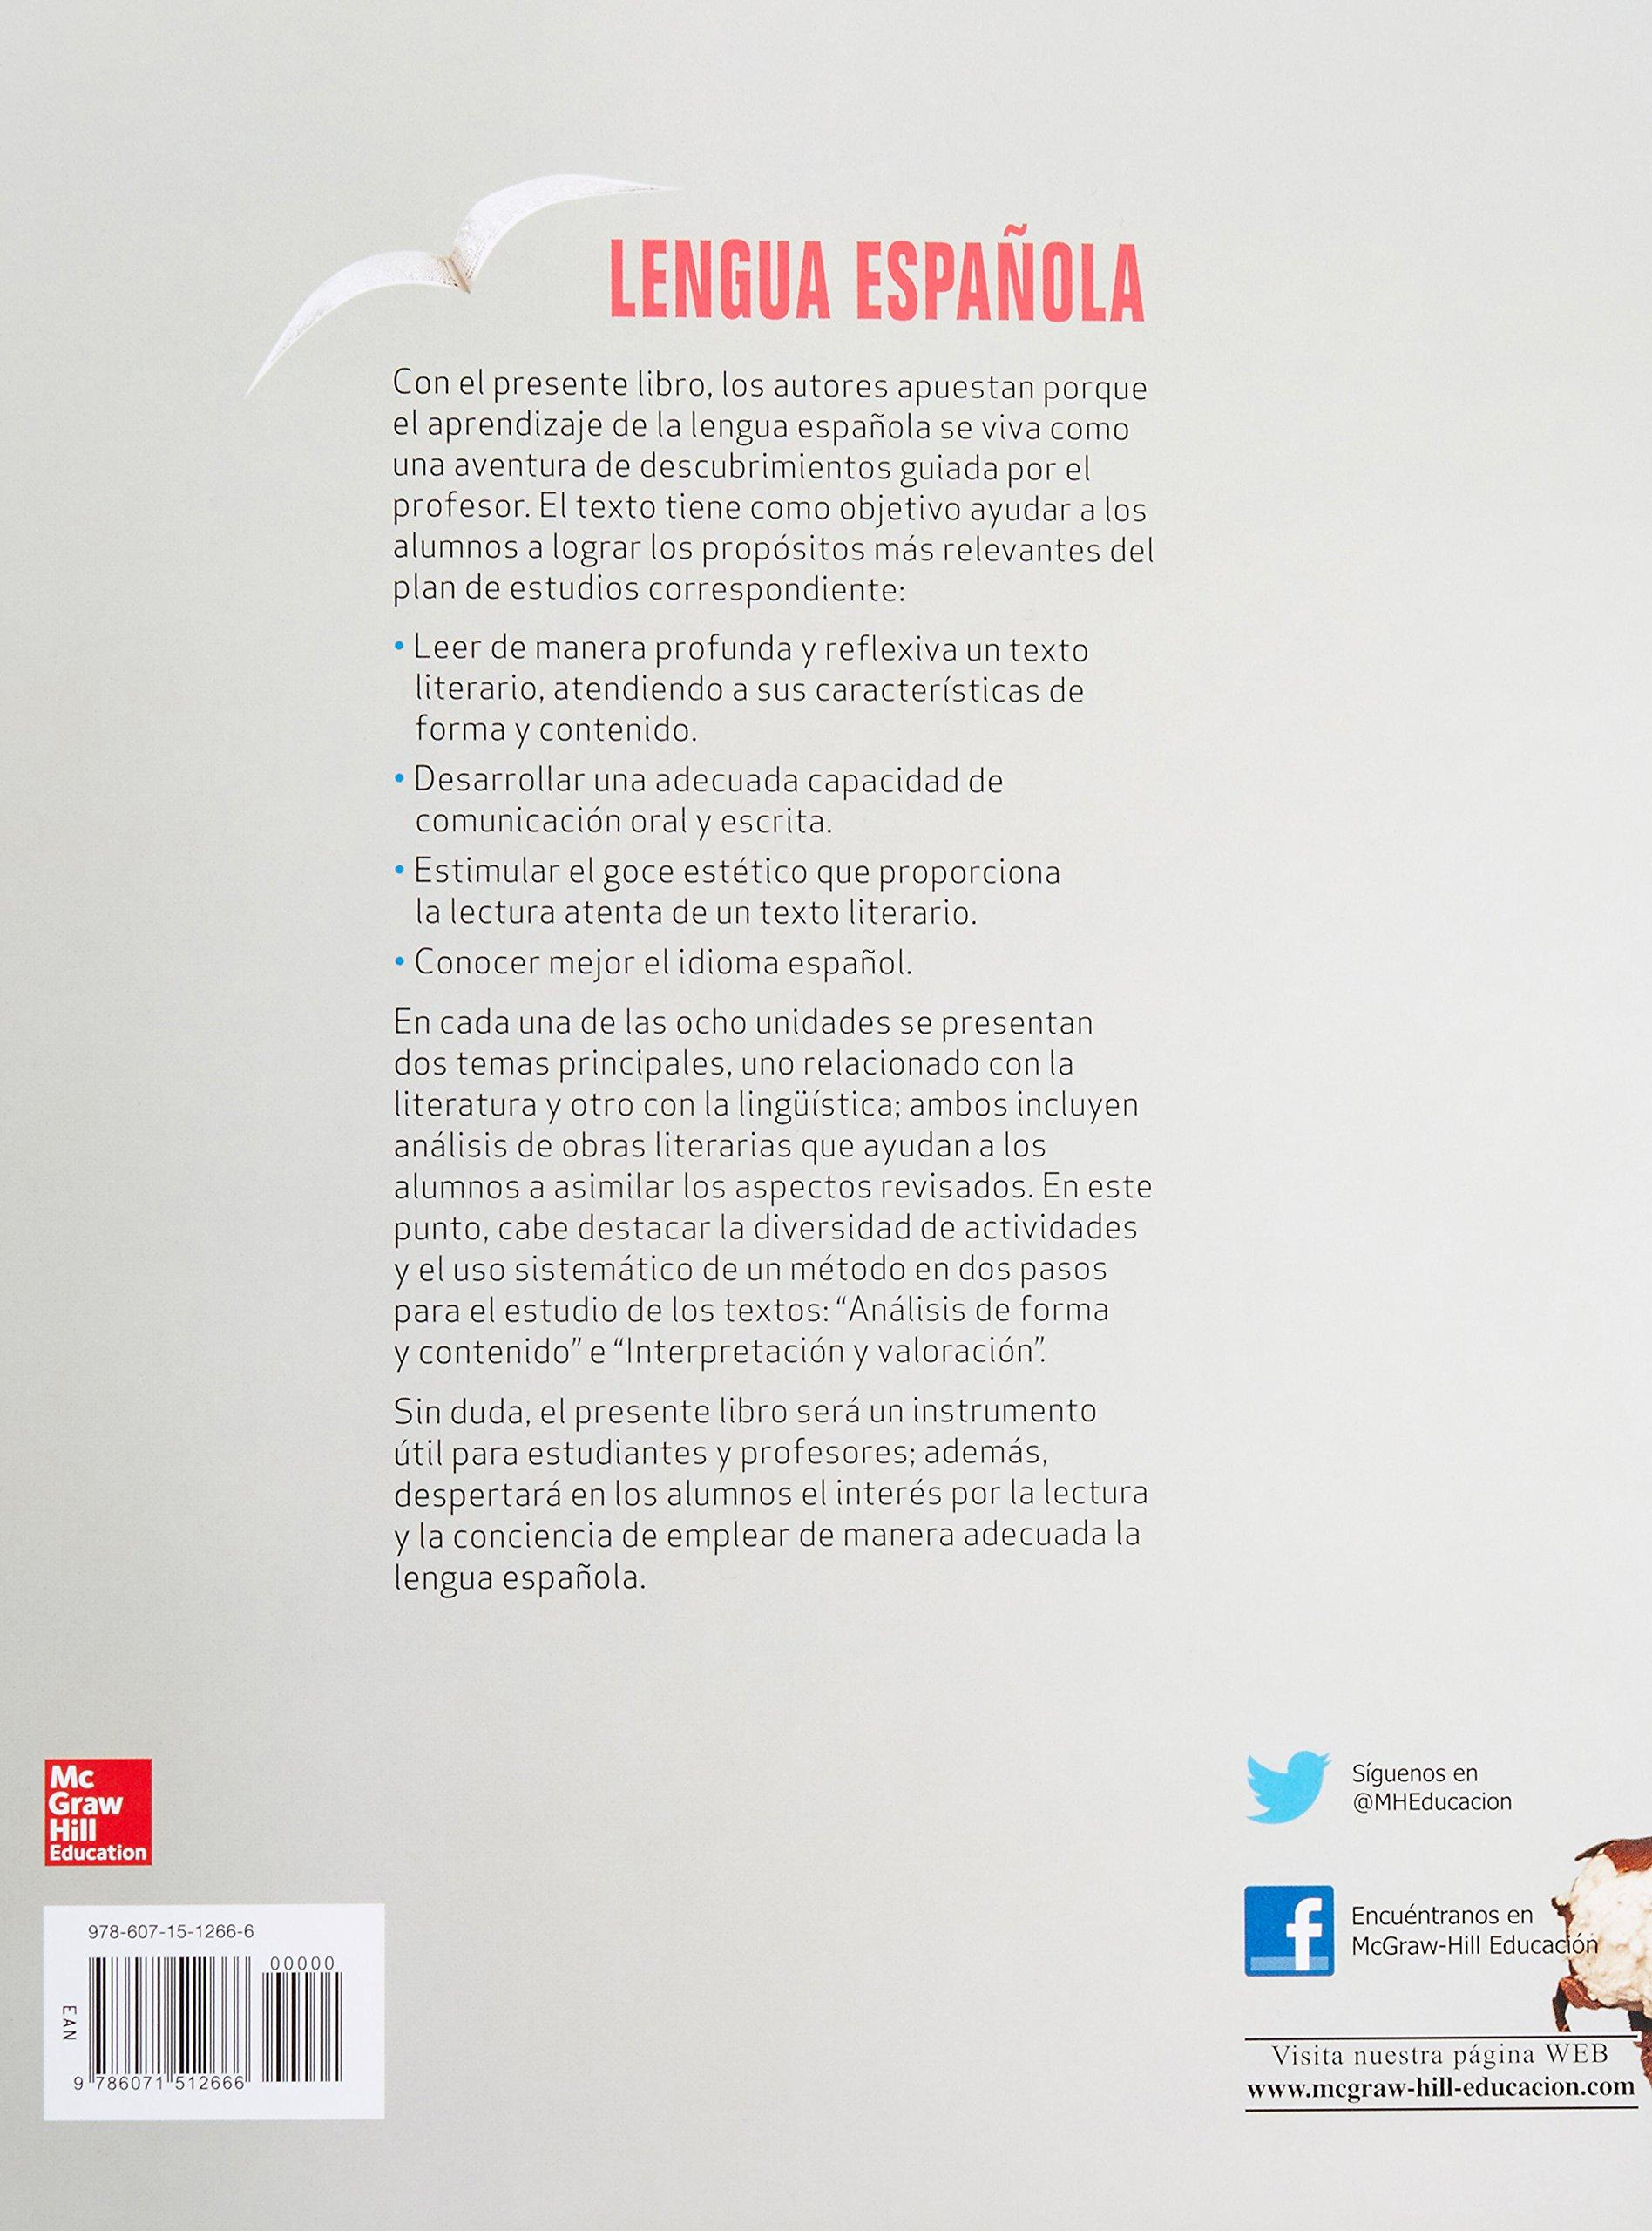 LENGUA ESPANOLA. BACHILLERATO: Amazon.es: JAVIER LOPEZ CAMPOY: Libros